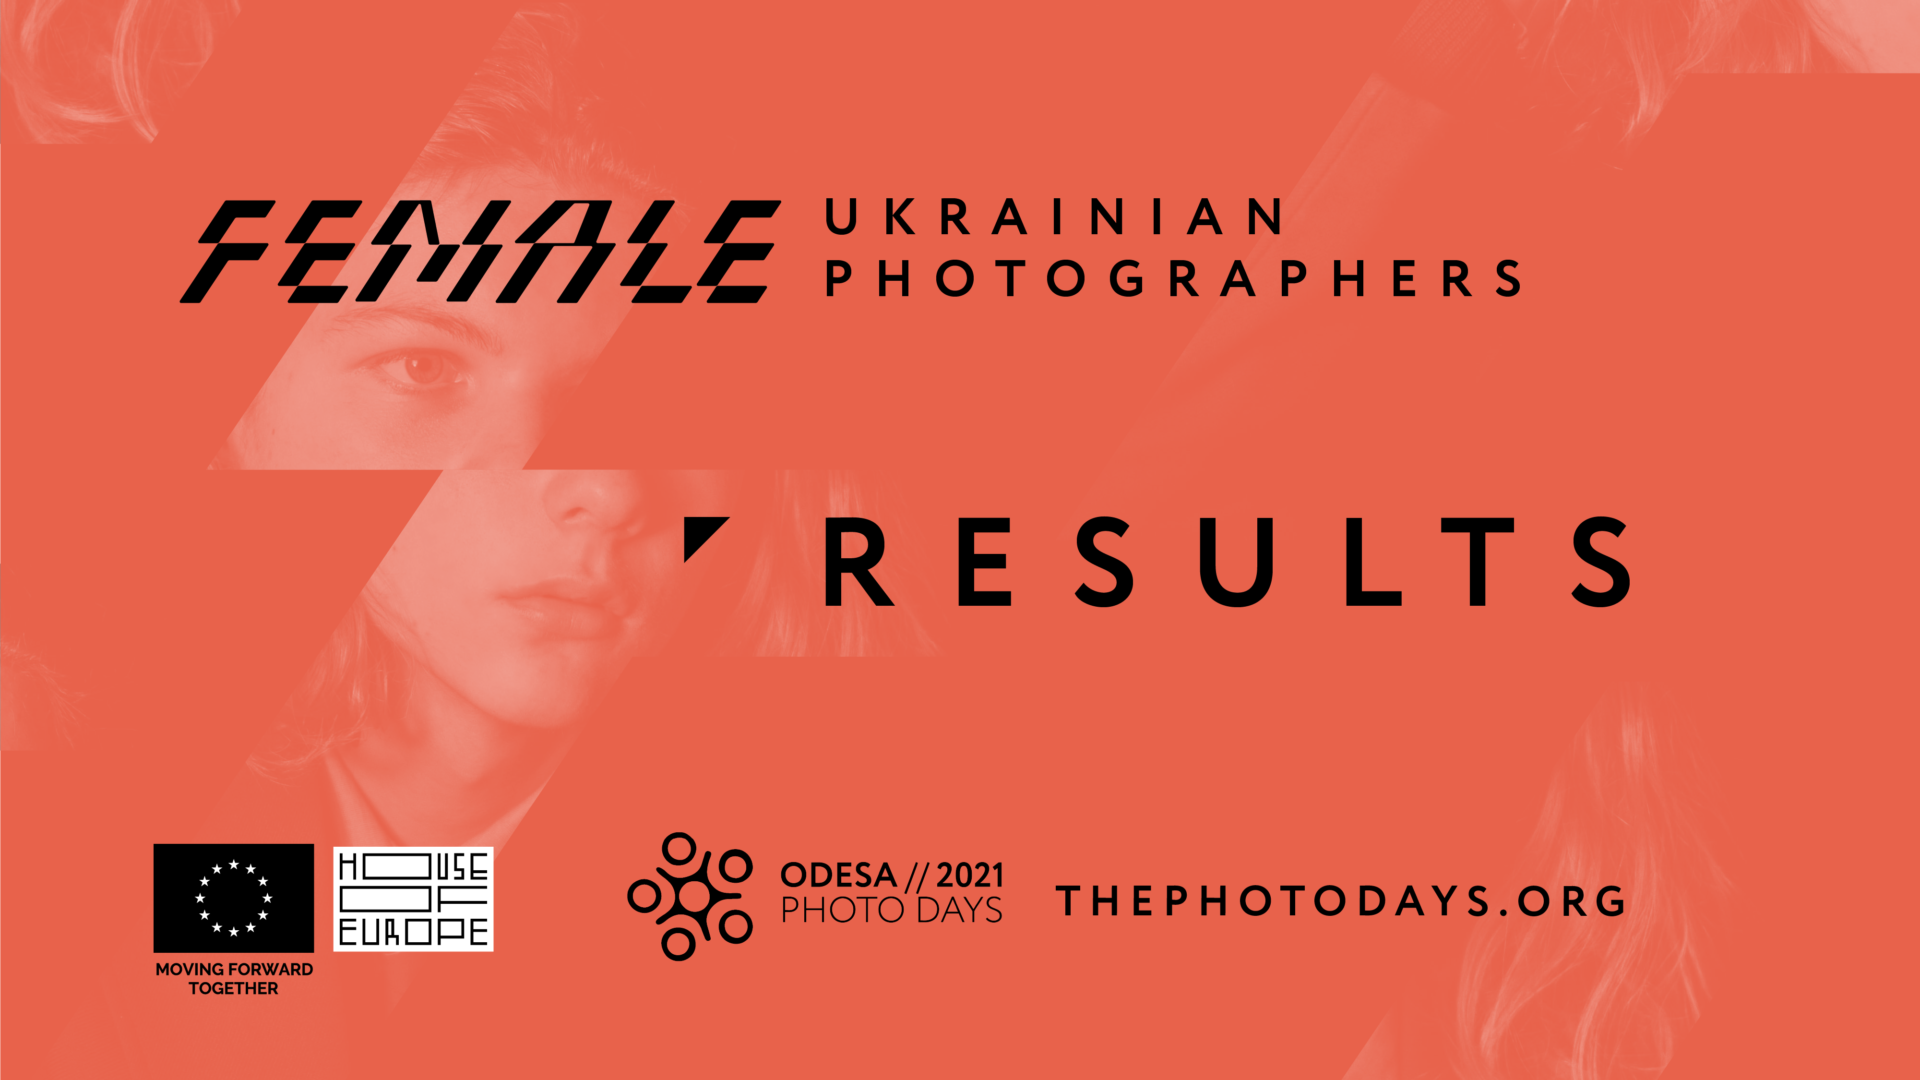 Female photographers result